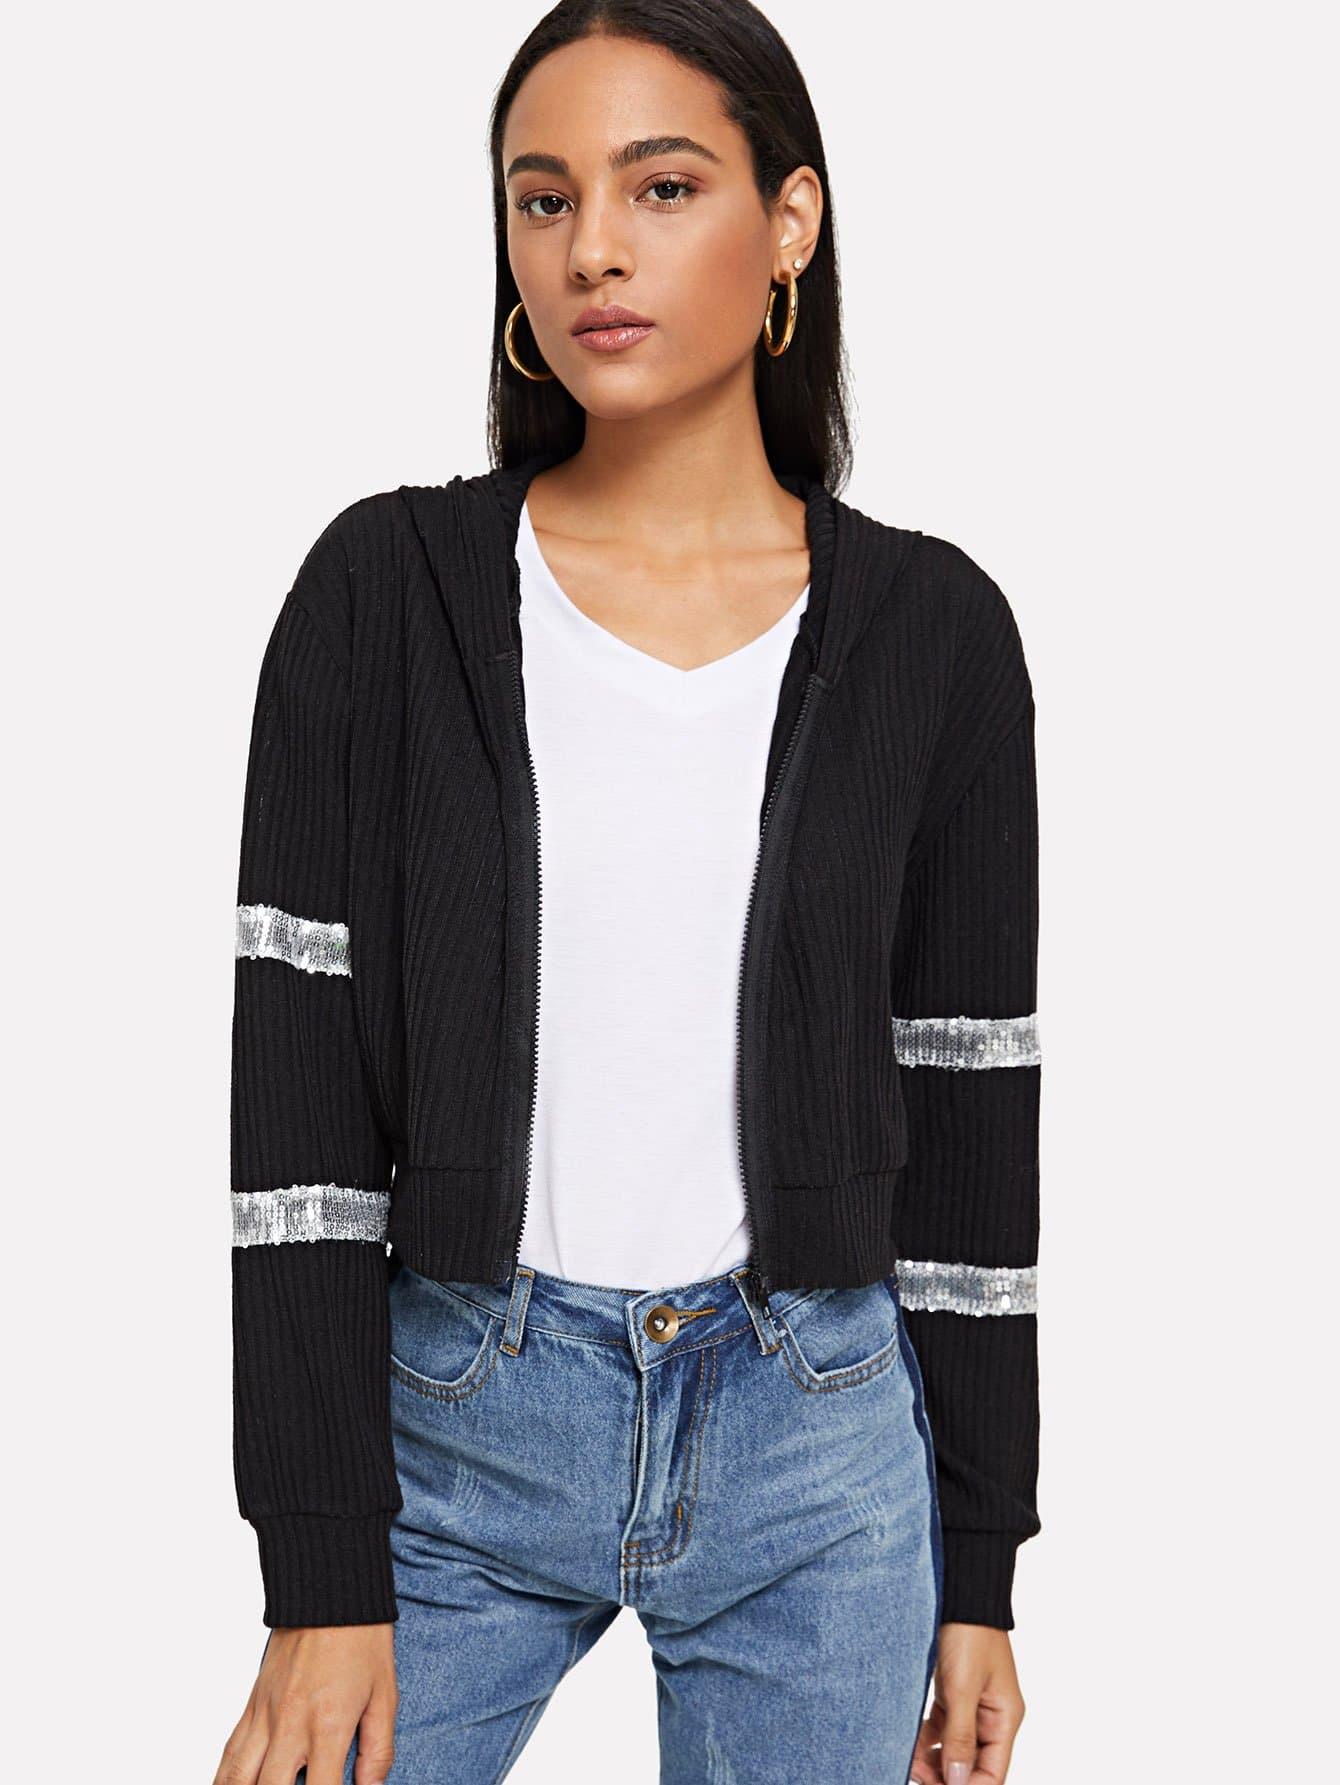 Sequin Contrast Ribbed Crop Jacket